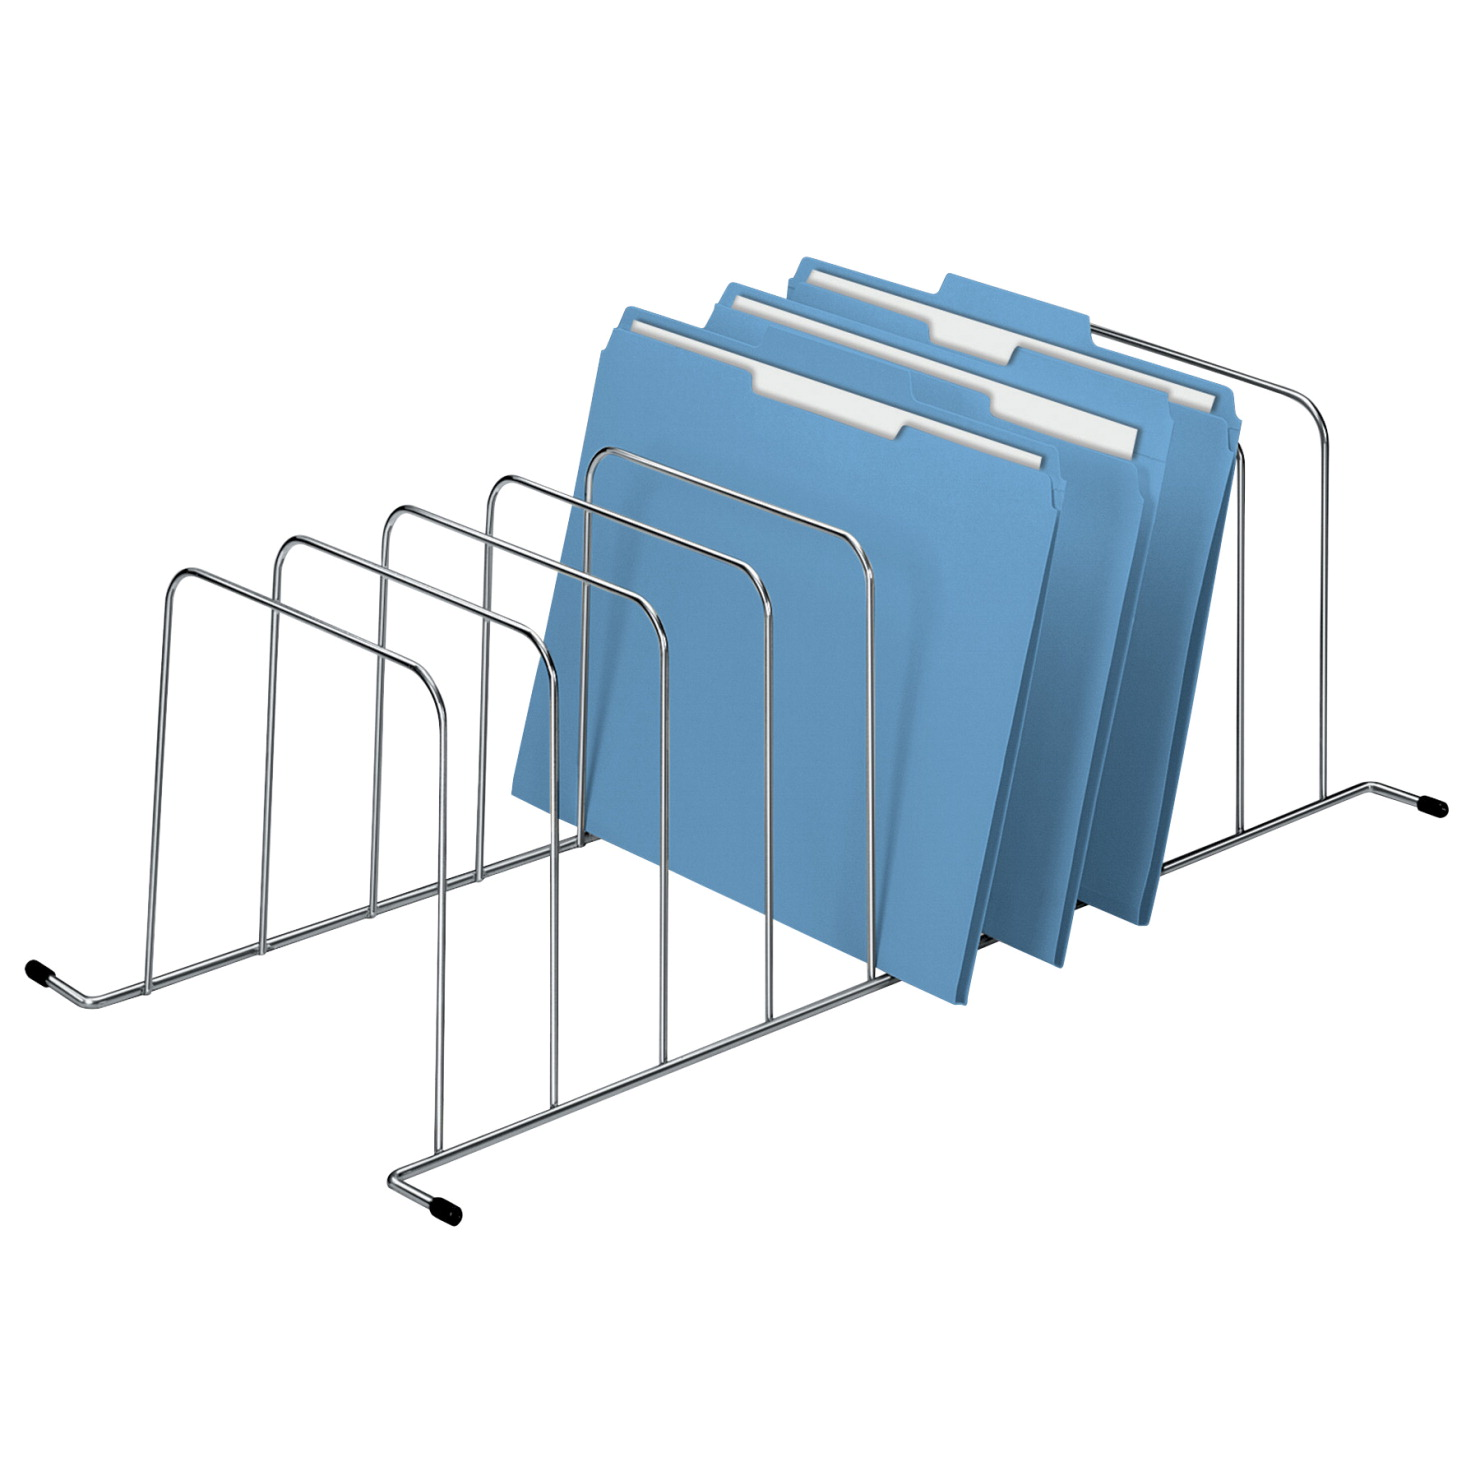 Fel Vertical File Organizer For Desktop Or Drawers 11 1 2 X 23